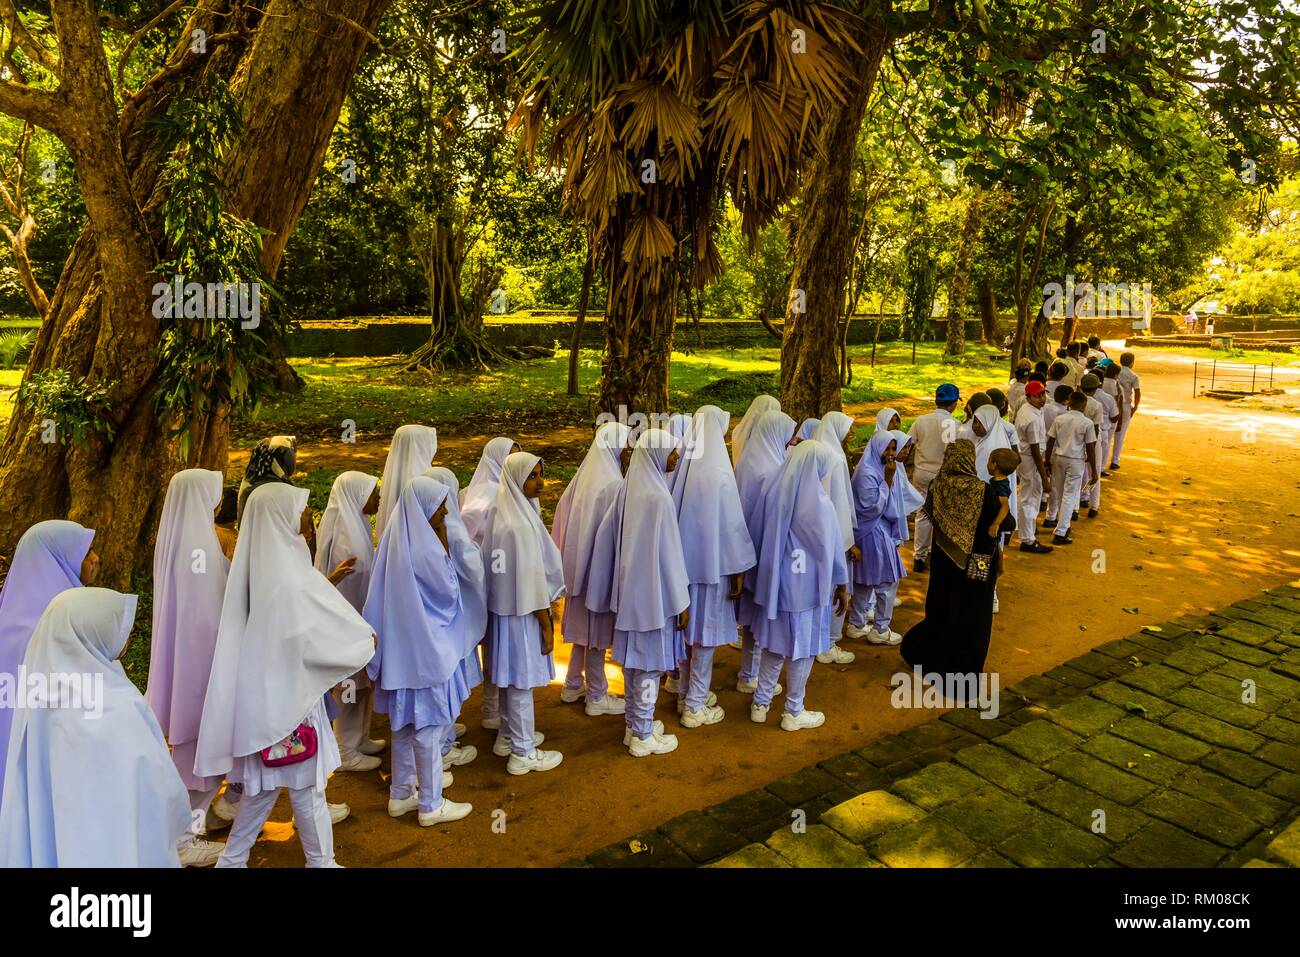 Muslim school girls, Sacred Quadrangle, Ruins of ancient city, Polonnaruwa, Sri Lanka. - Stock Image